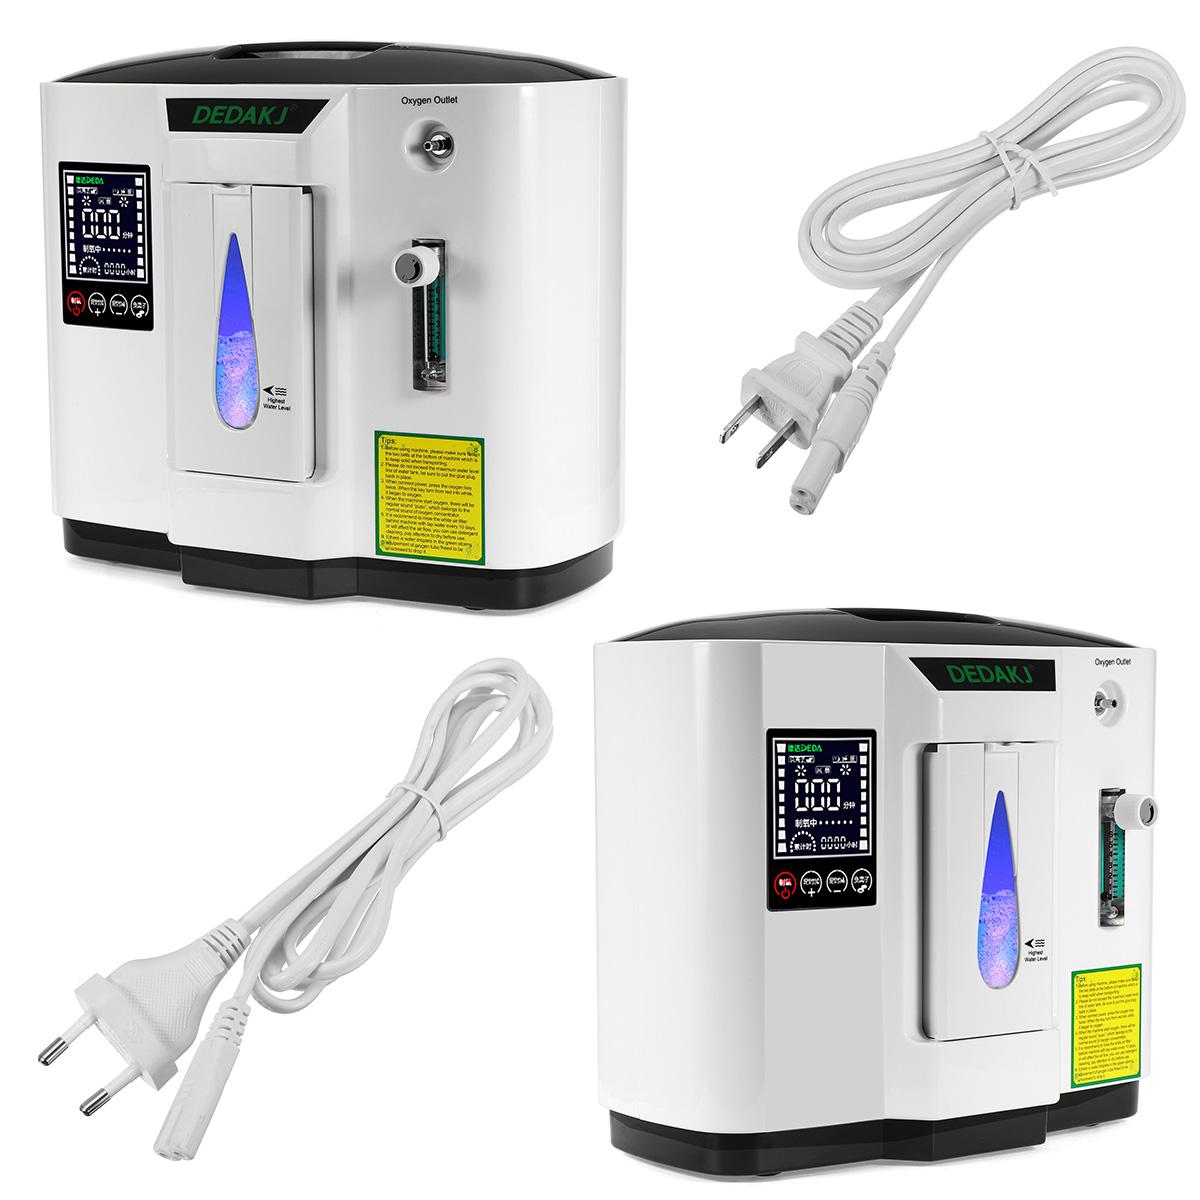 DDT-1A 6L Oxygen Concentrator Portab